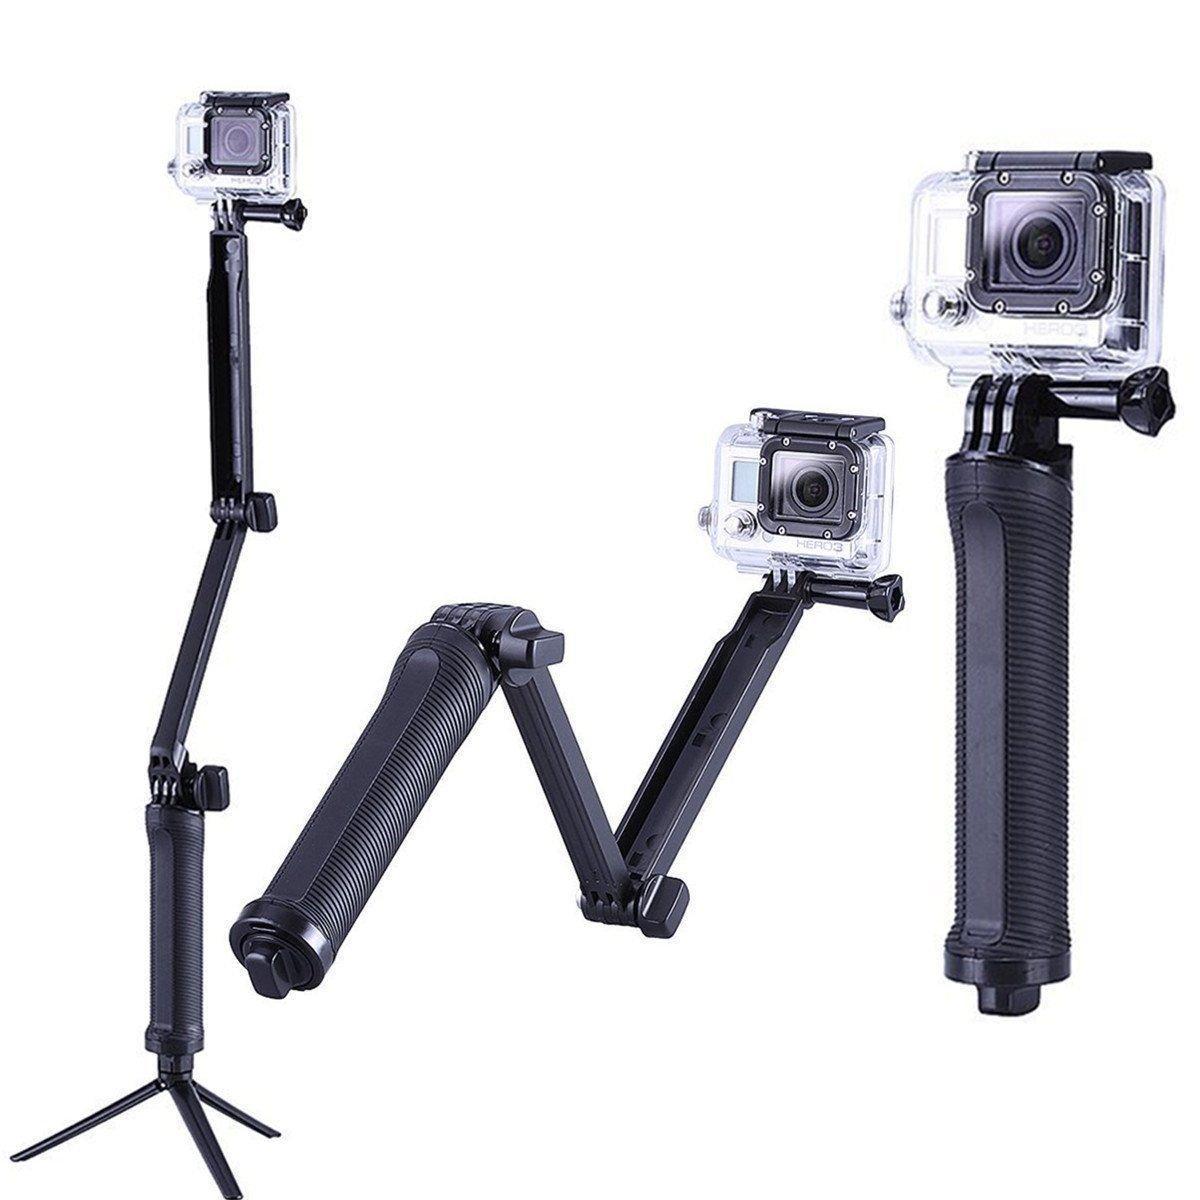 3 Way Grip Waterproof Monopod Selfie Stick For Gopro Hero 5 6 4 Black Session SJ4000 For Xiaomi Yi 4K Sports Camera Tripod Stand